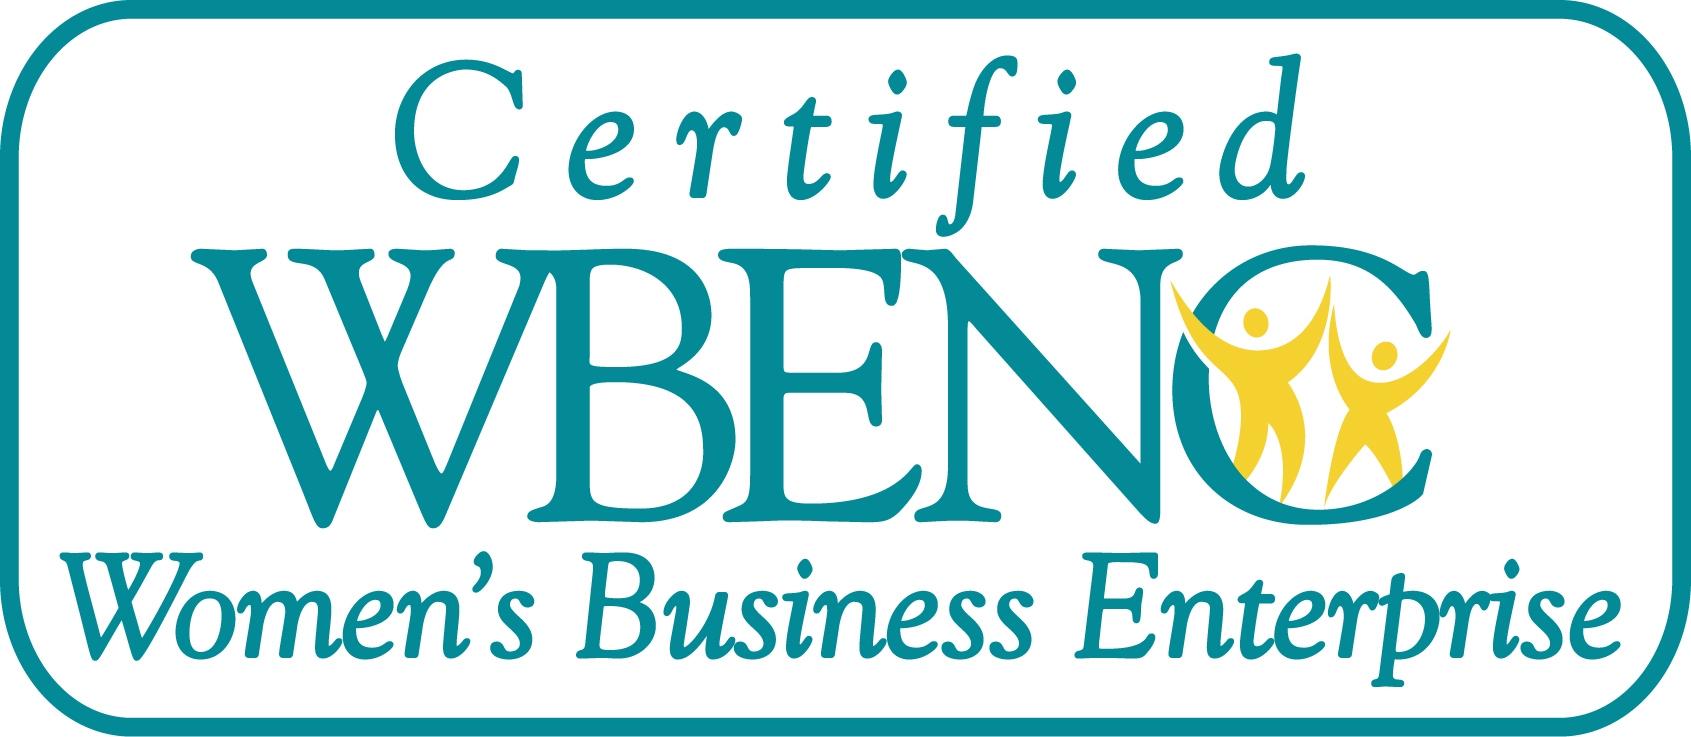 - DoveLin Enterpirses, Inc. is proud to be a Women's Business Enterprise.